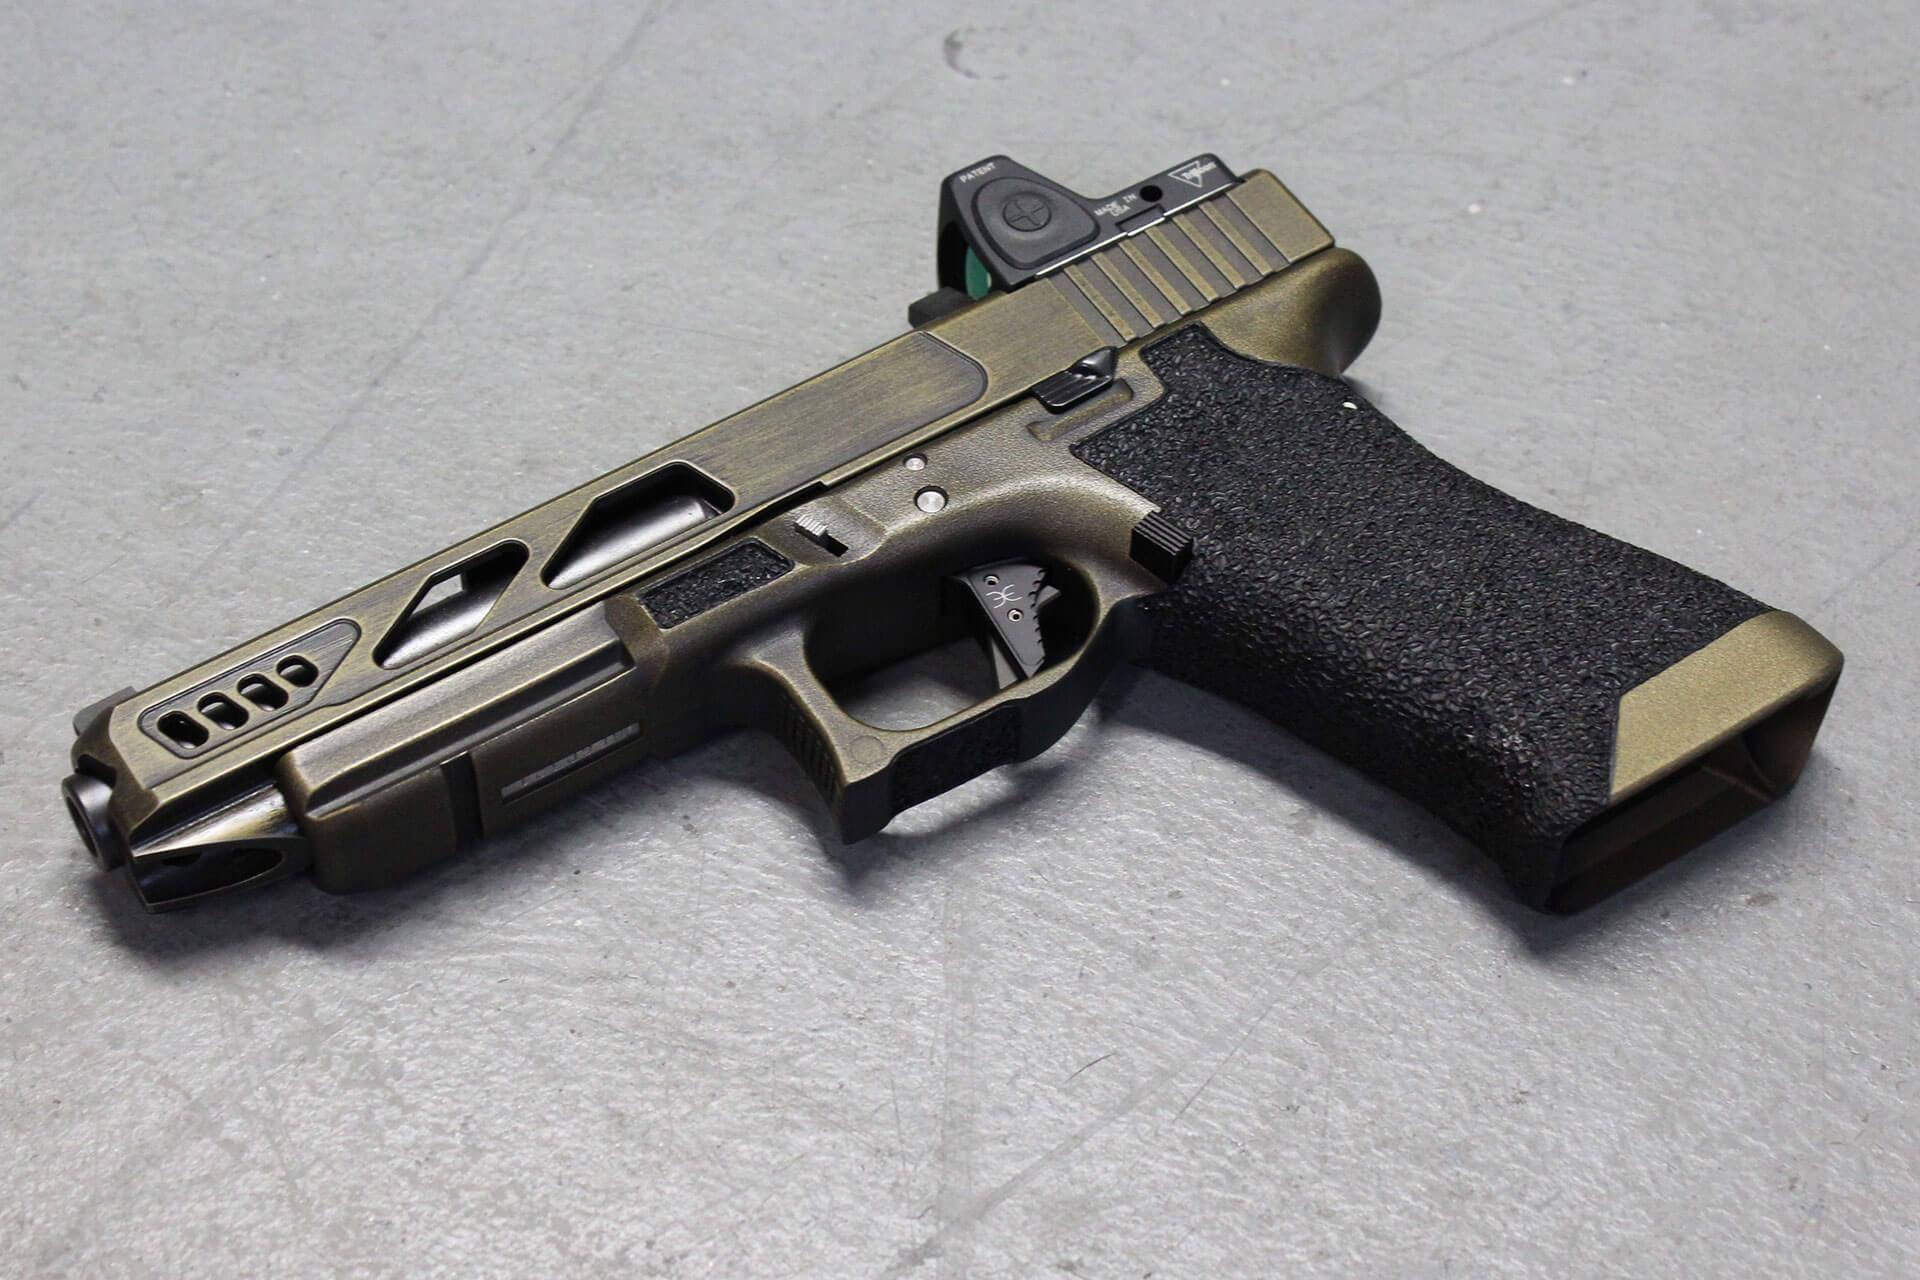 Evolve Weapon System Glock 17 Image